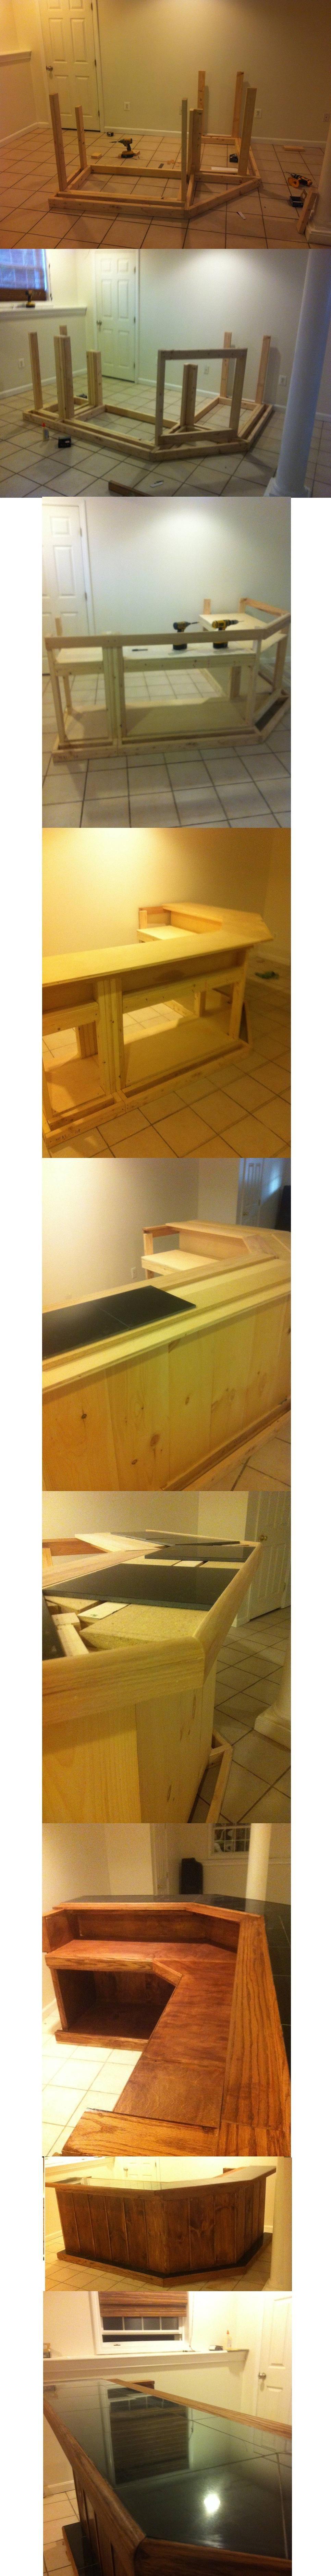 Homemade bar (First big project!) | Basements, Homemade and Bar